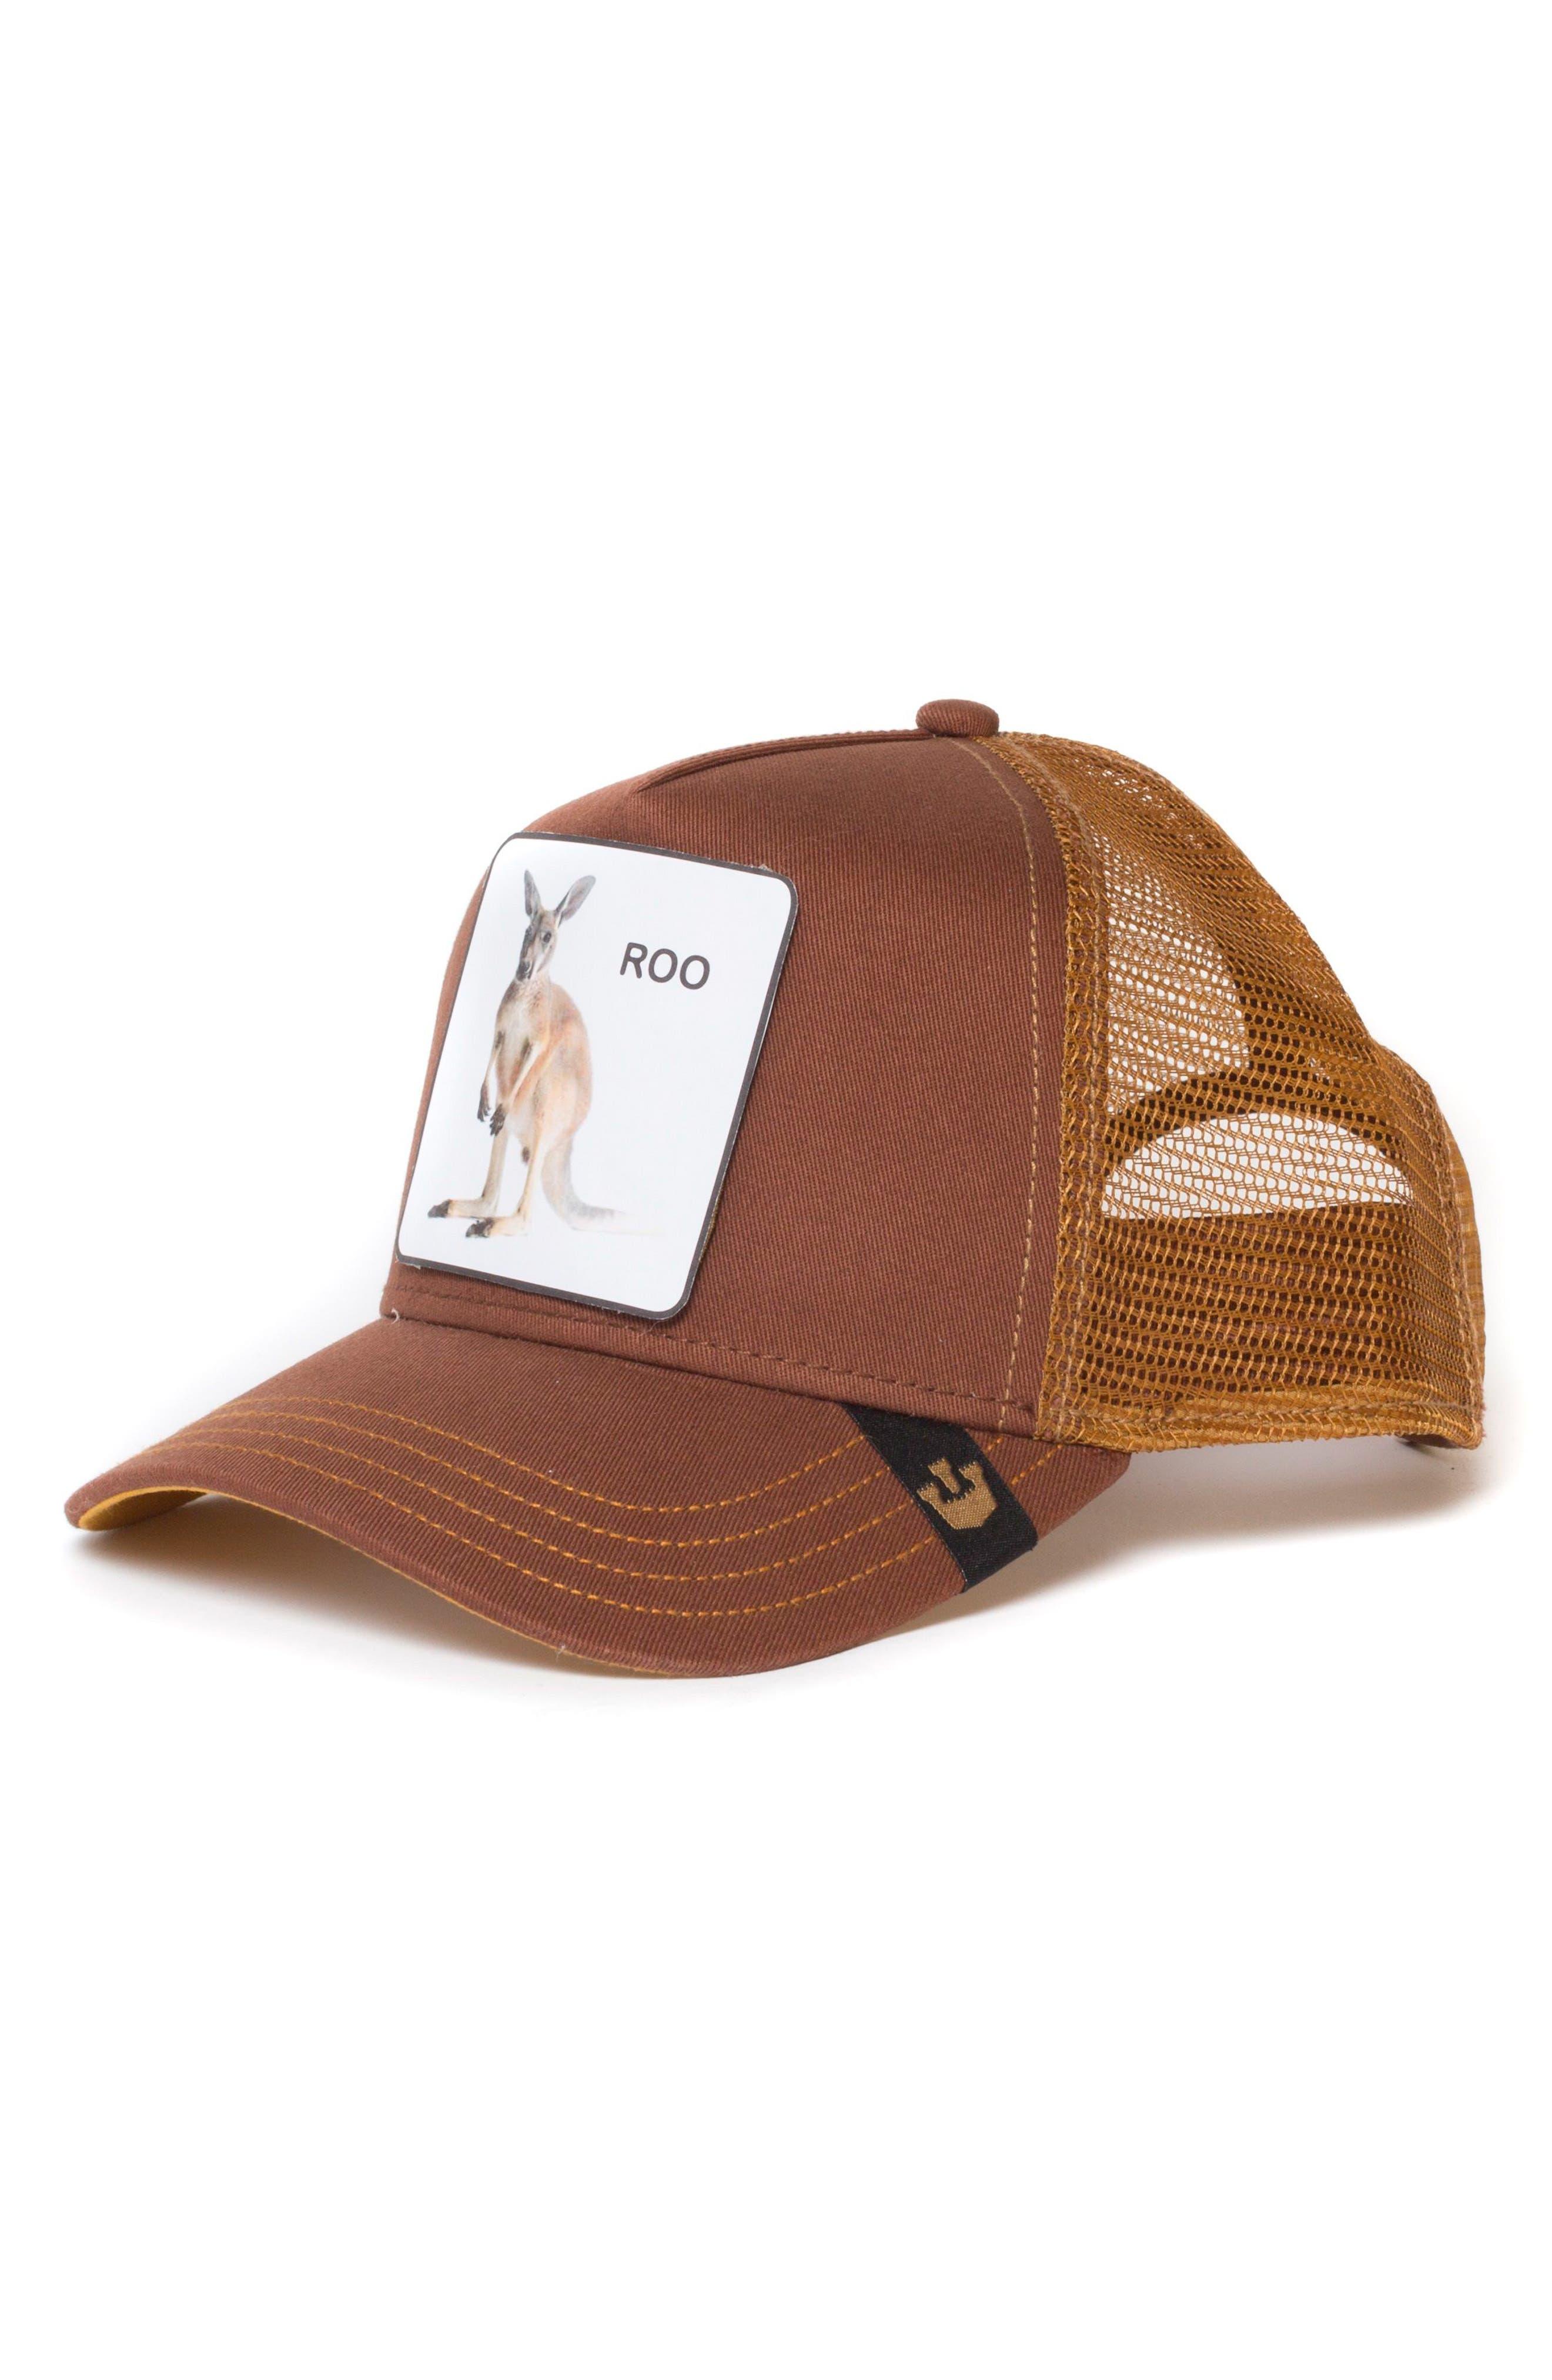 Kangaroo Trucker Hat,                             Main thumbnail 1, color,                             201